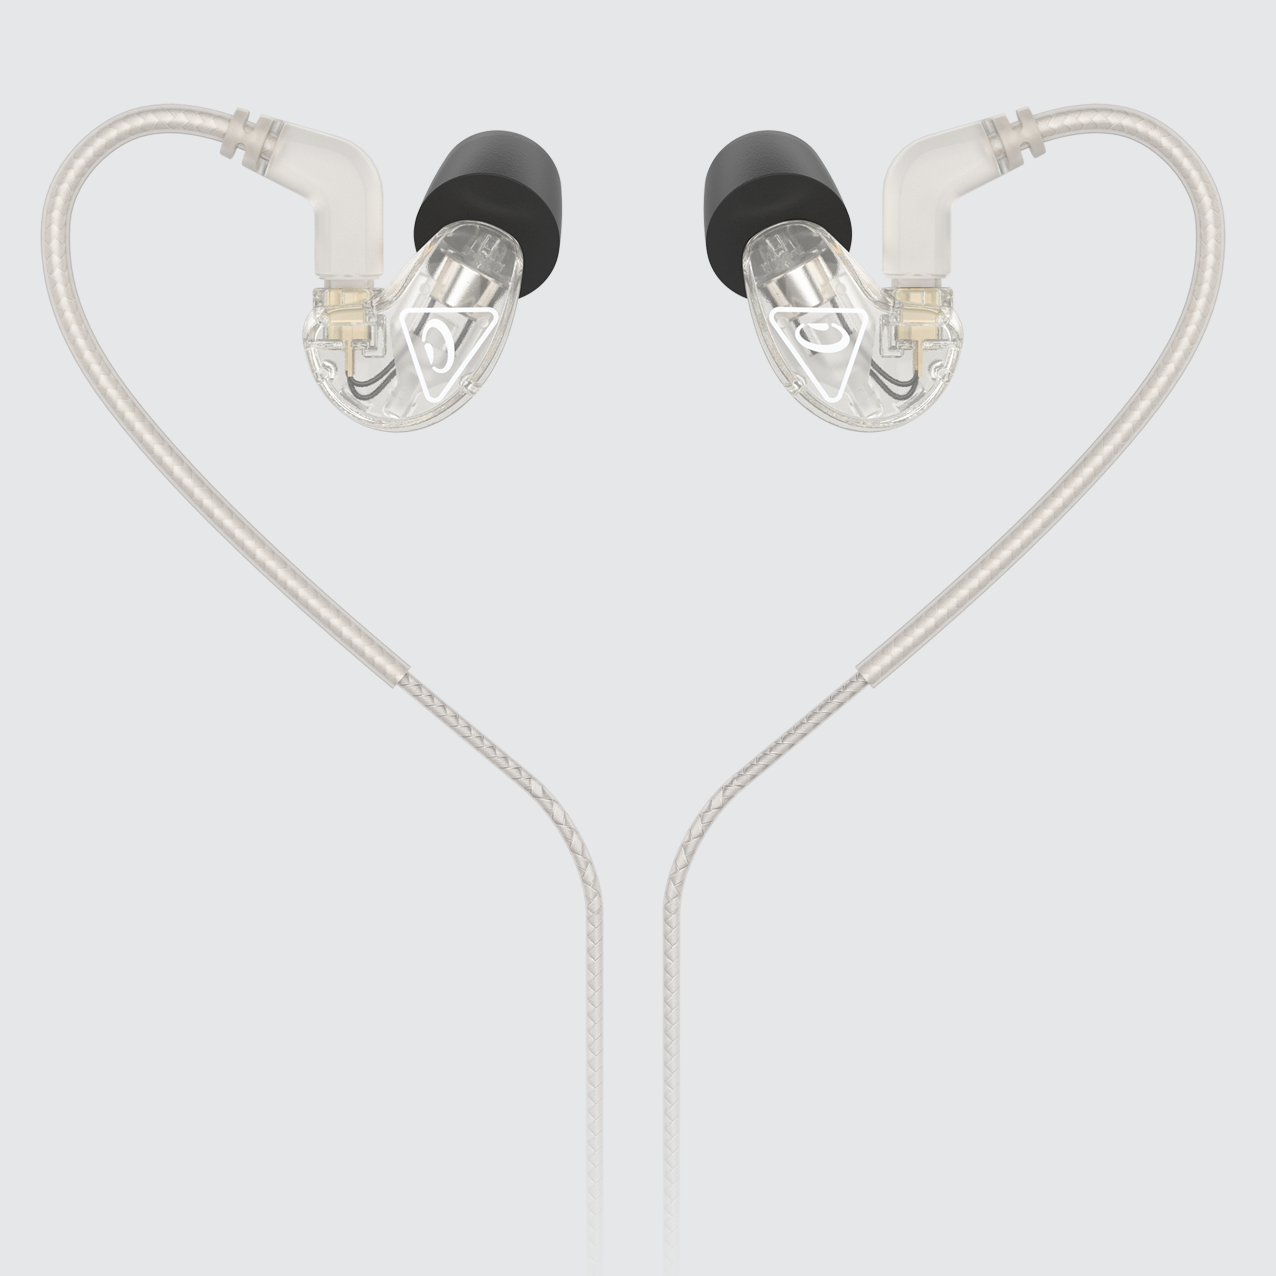 SD251-CL – Professional In-Ear Studio Monitor